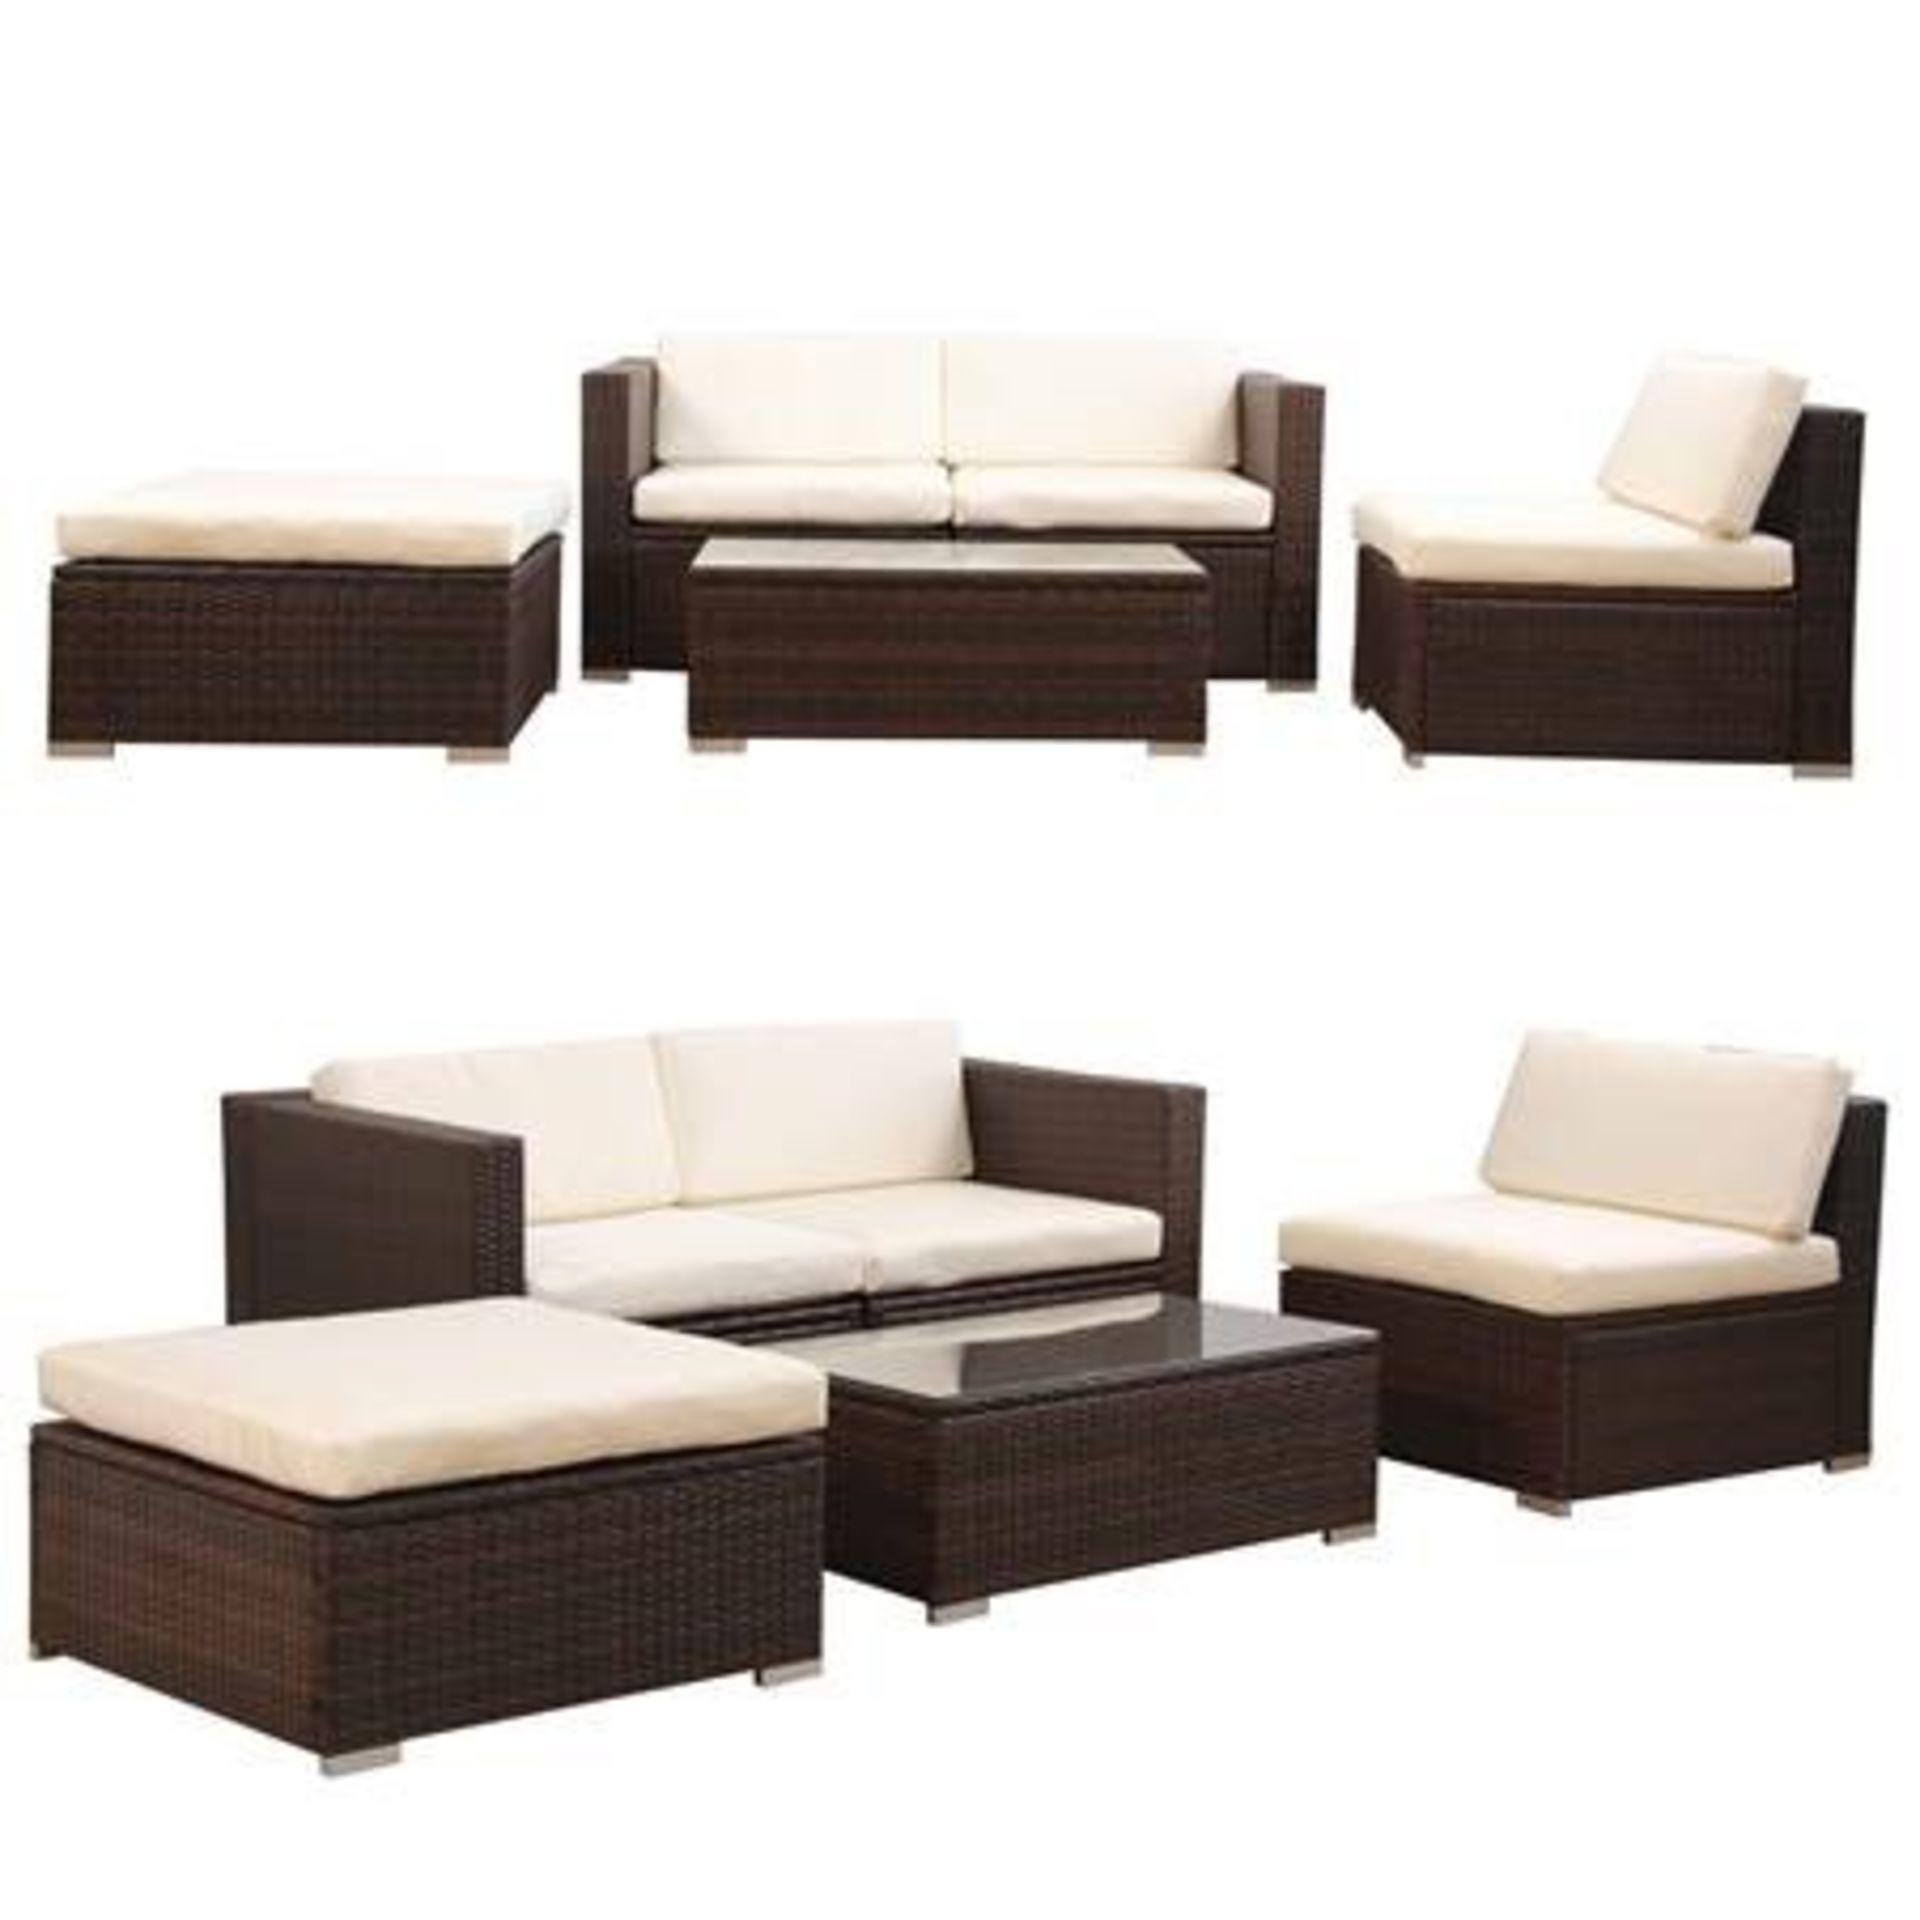 + VAT Brand New Chelsea Garden Company Modular Light Brown Rattan Corner Sofa Set With Ivory - Image 2 of 2